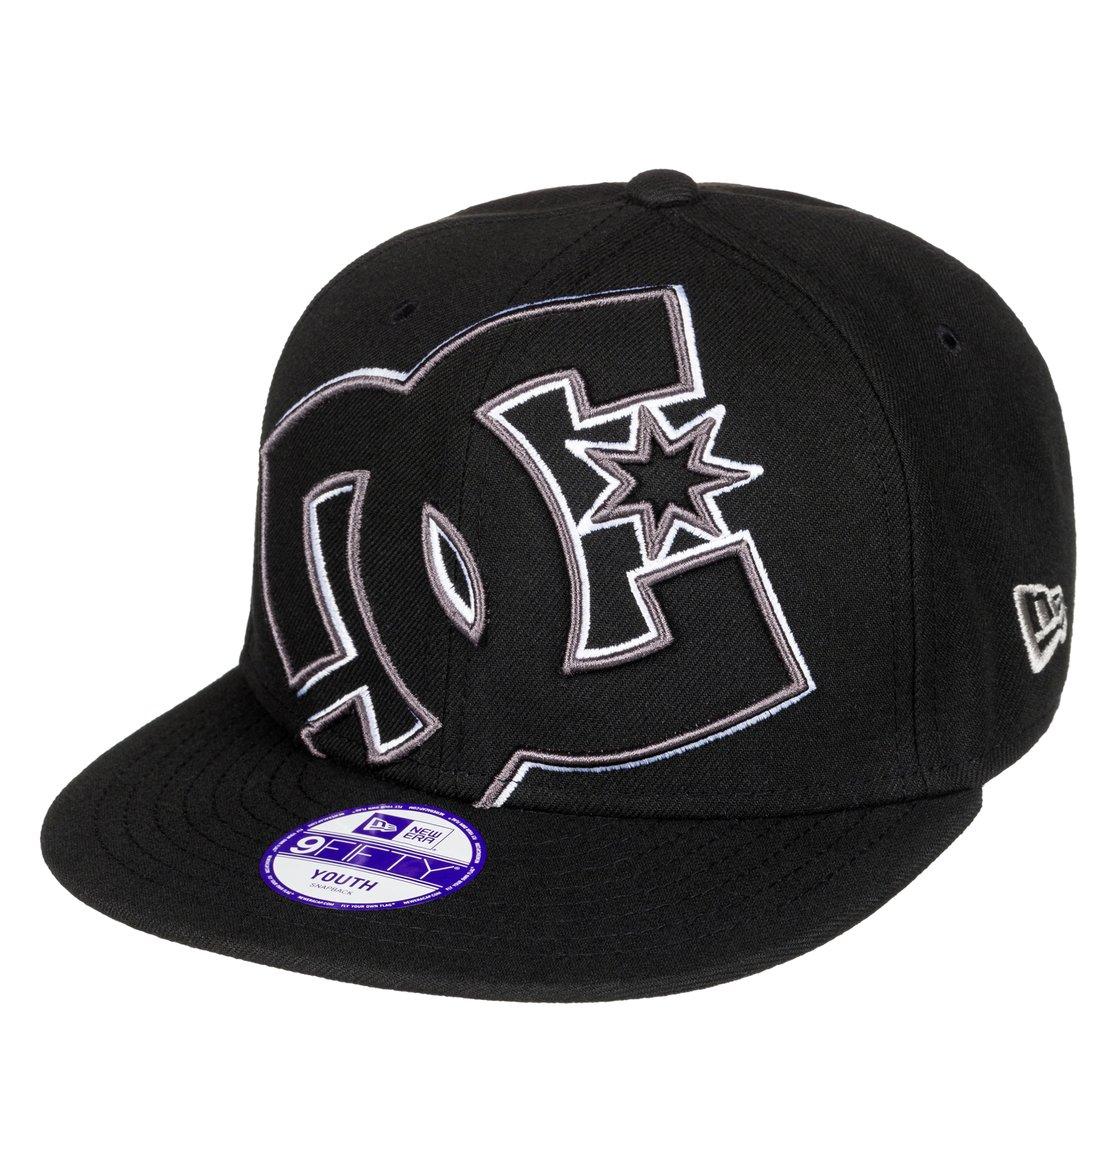 Dc Shoes Hats New Era